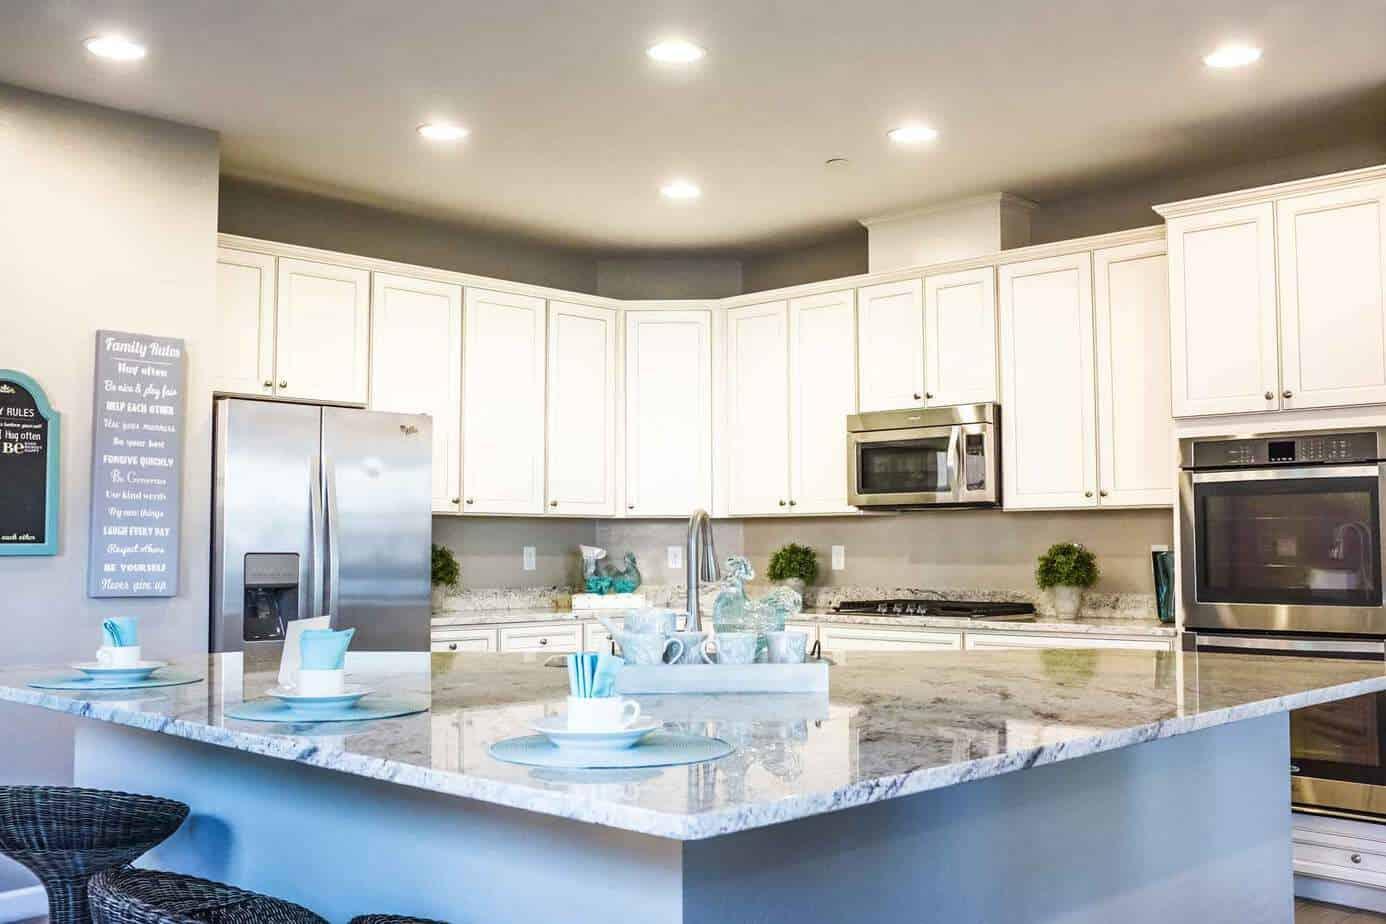 Property kitchen Plymouth